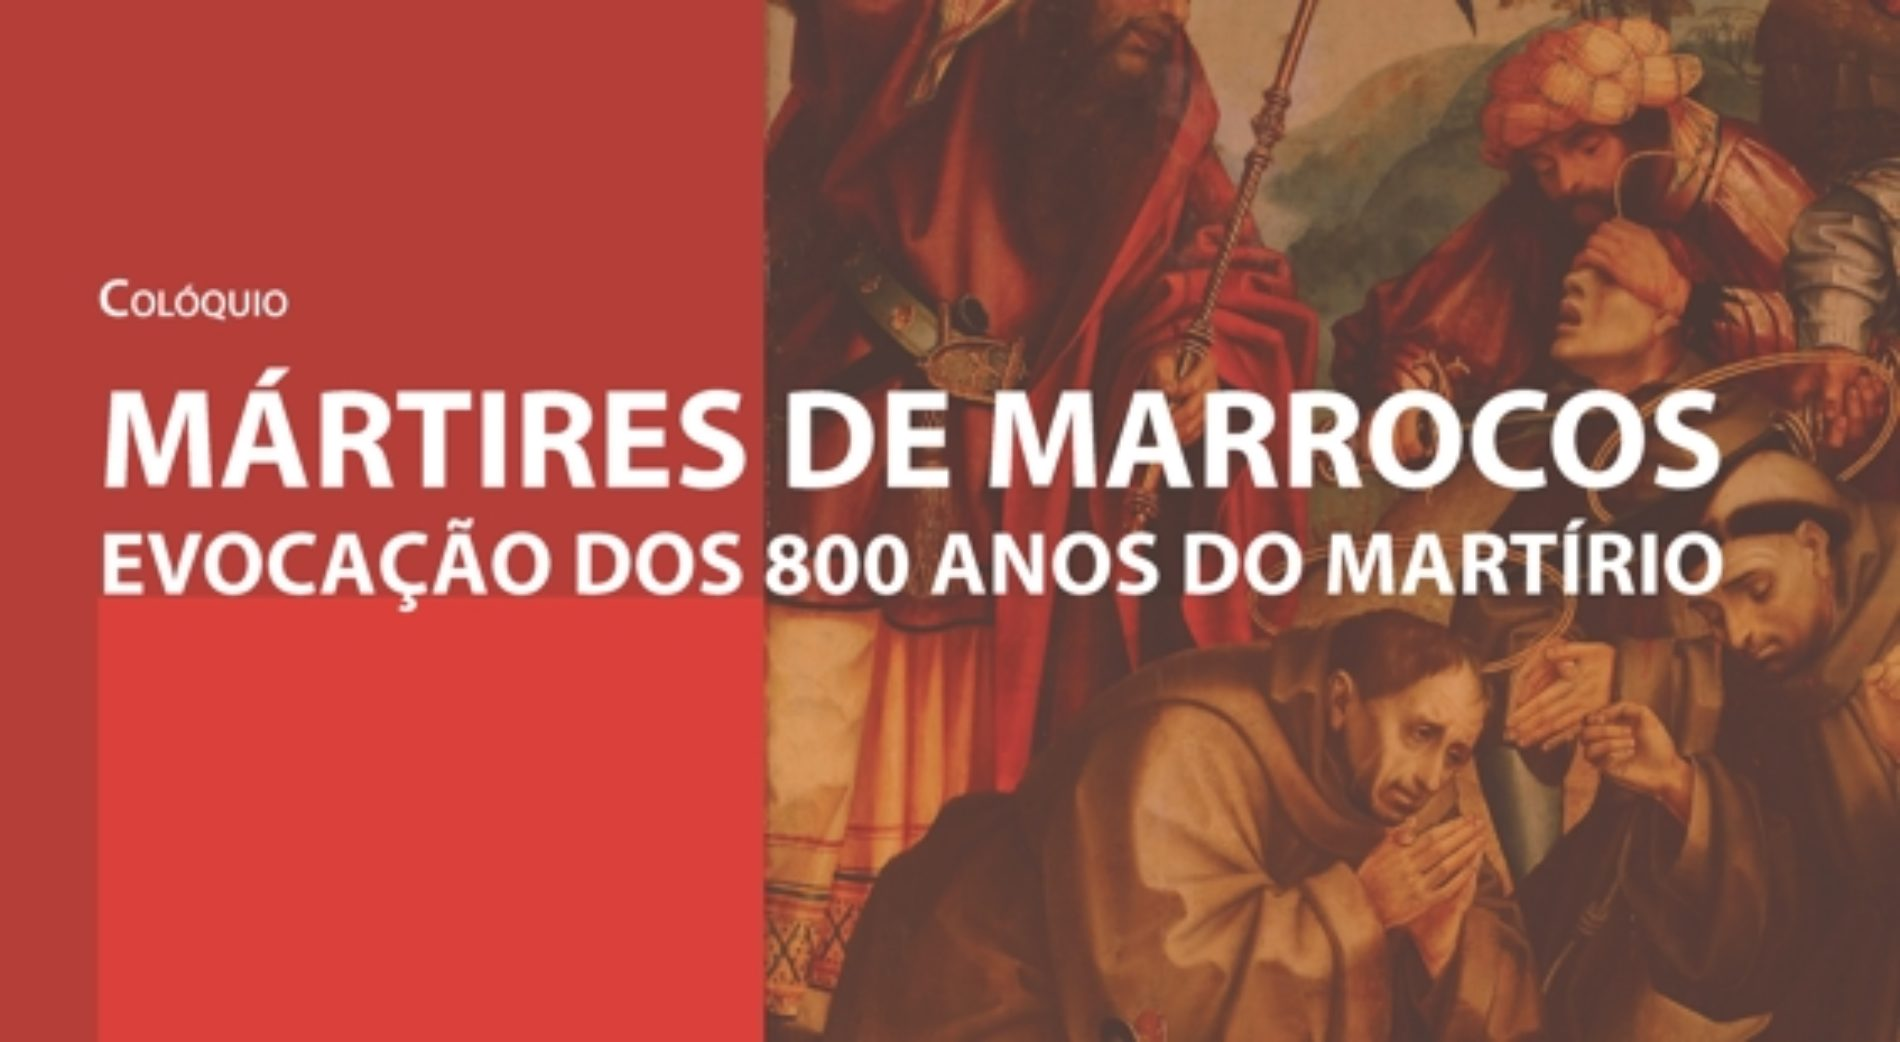 Jubileu de Santo António e dos Mártires de Marrocos inicia semana com programa diversificado